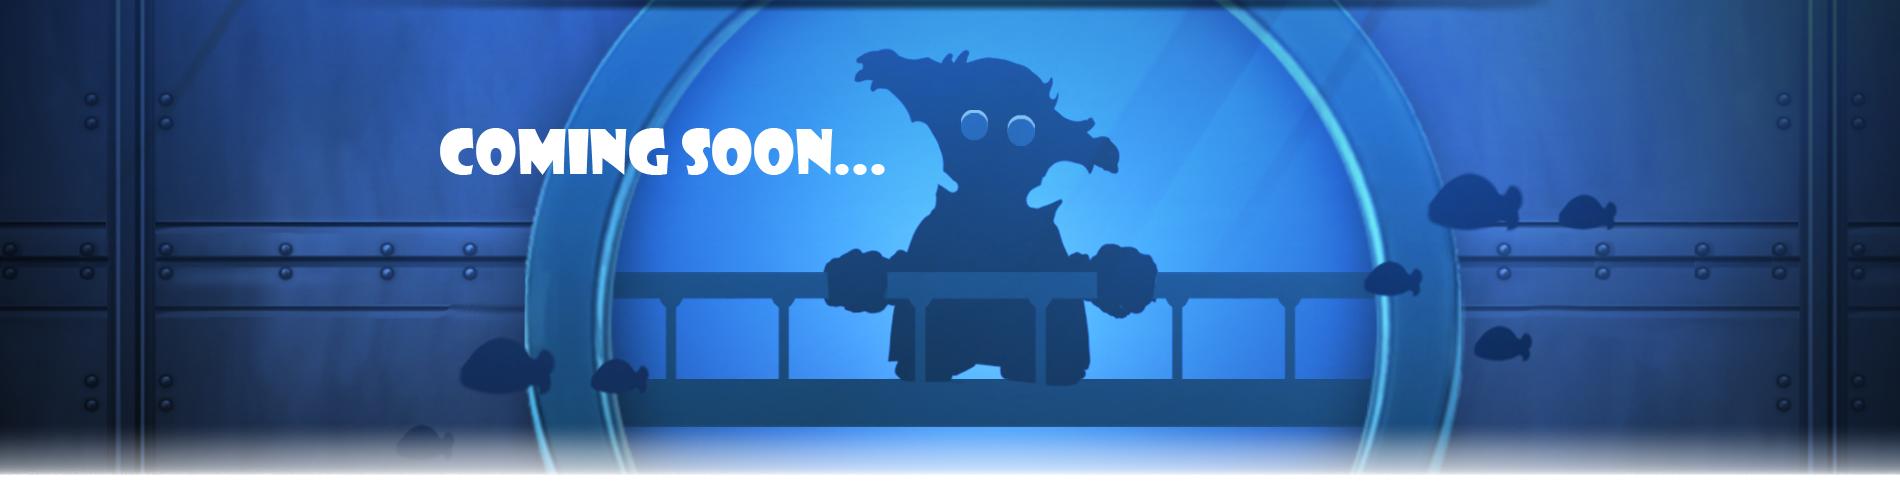 1900x500coming soon